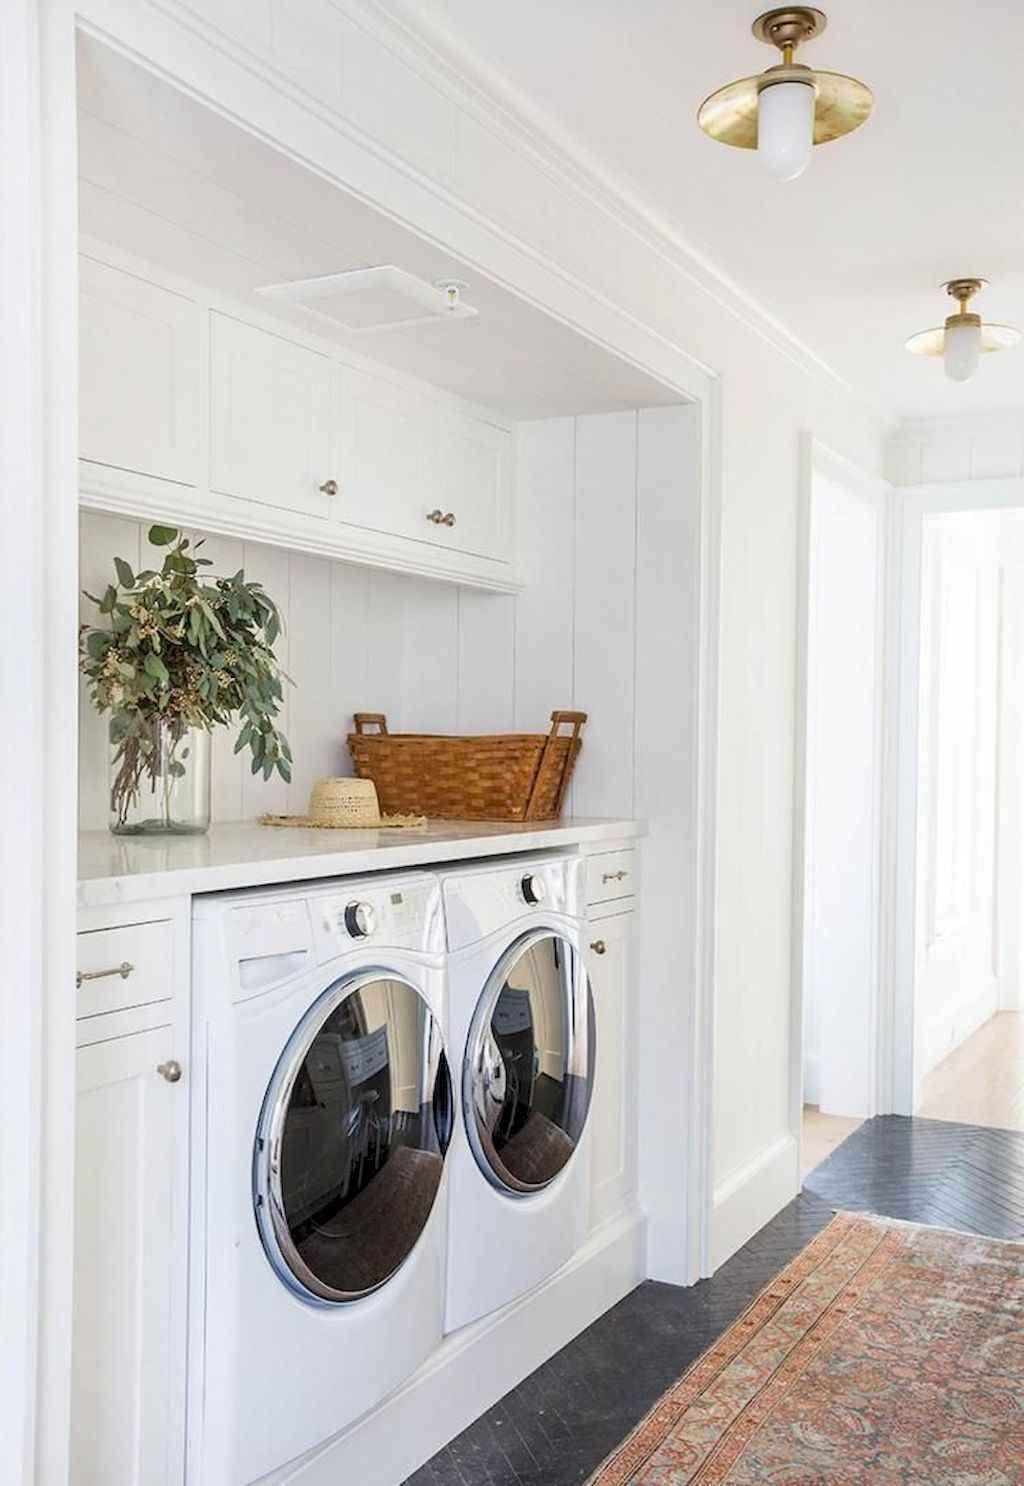 45 the best laundry room storage decor ideas modern on extraordinary small laundry room design and decorating ideas modest laundry space id=23653